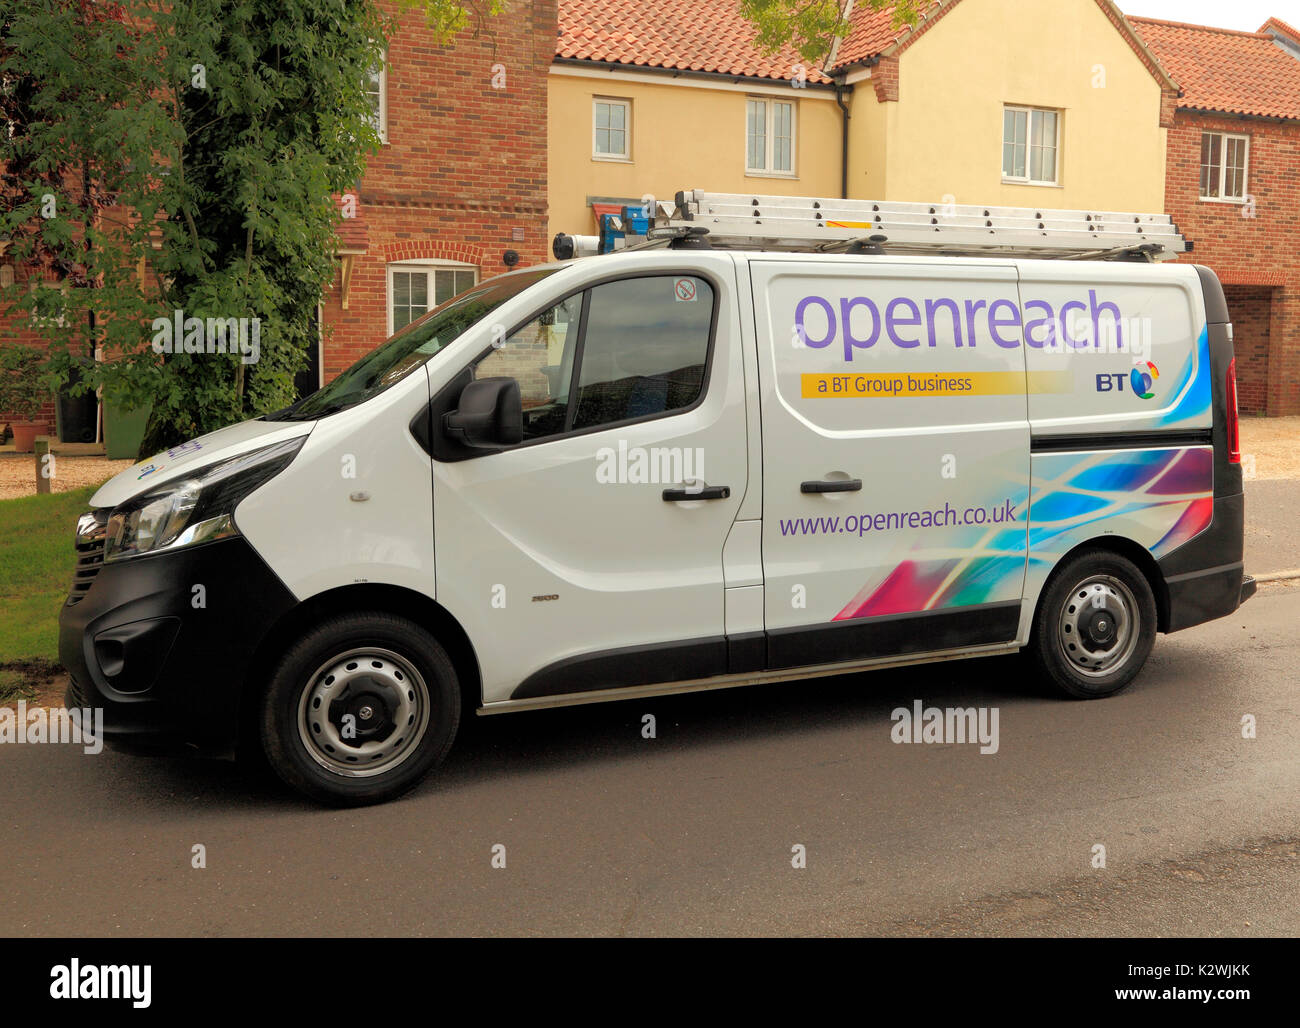 Openreach, Open Reach, BT, British Telecom, van, service, repair, vehicle, vehicles, vans, repairs, maintenance, - Stock Image